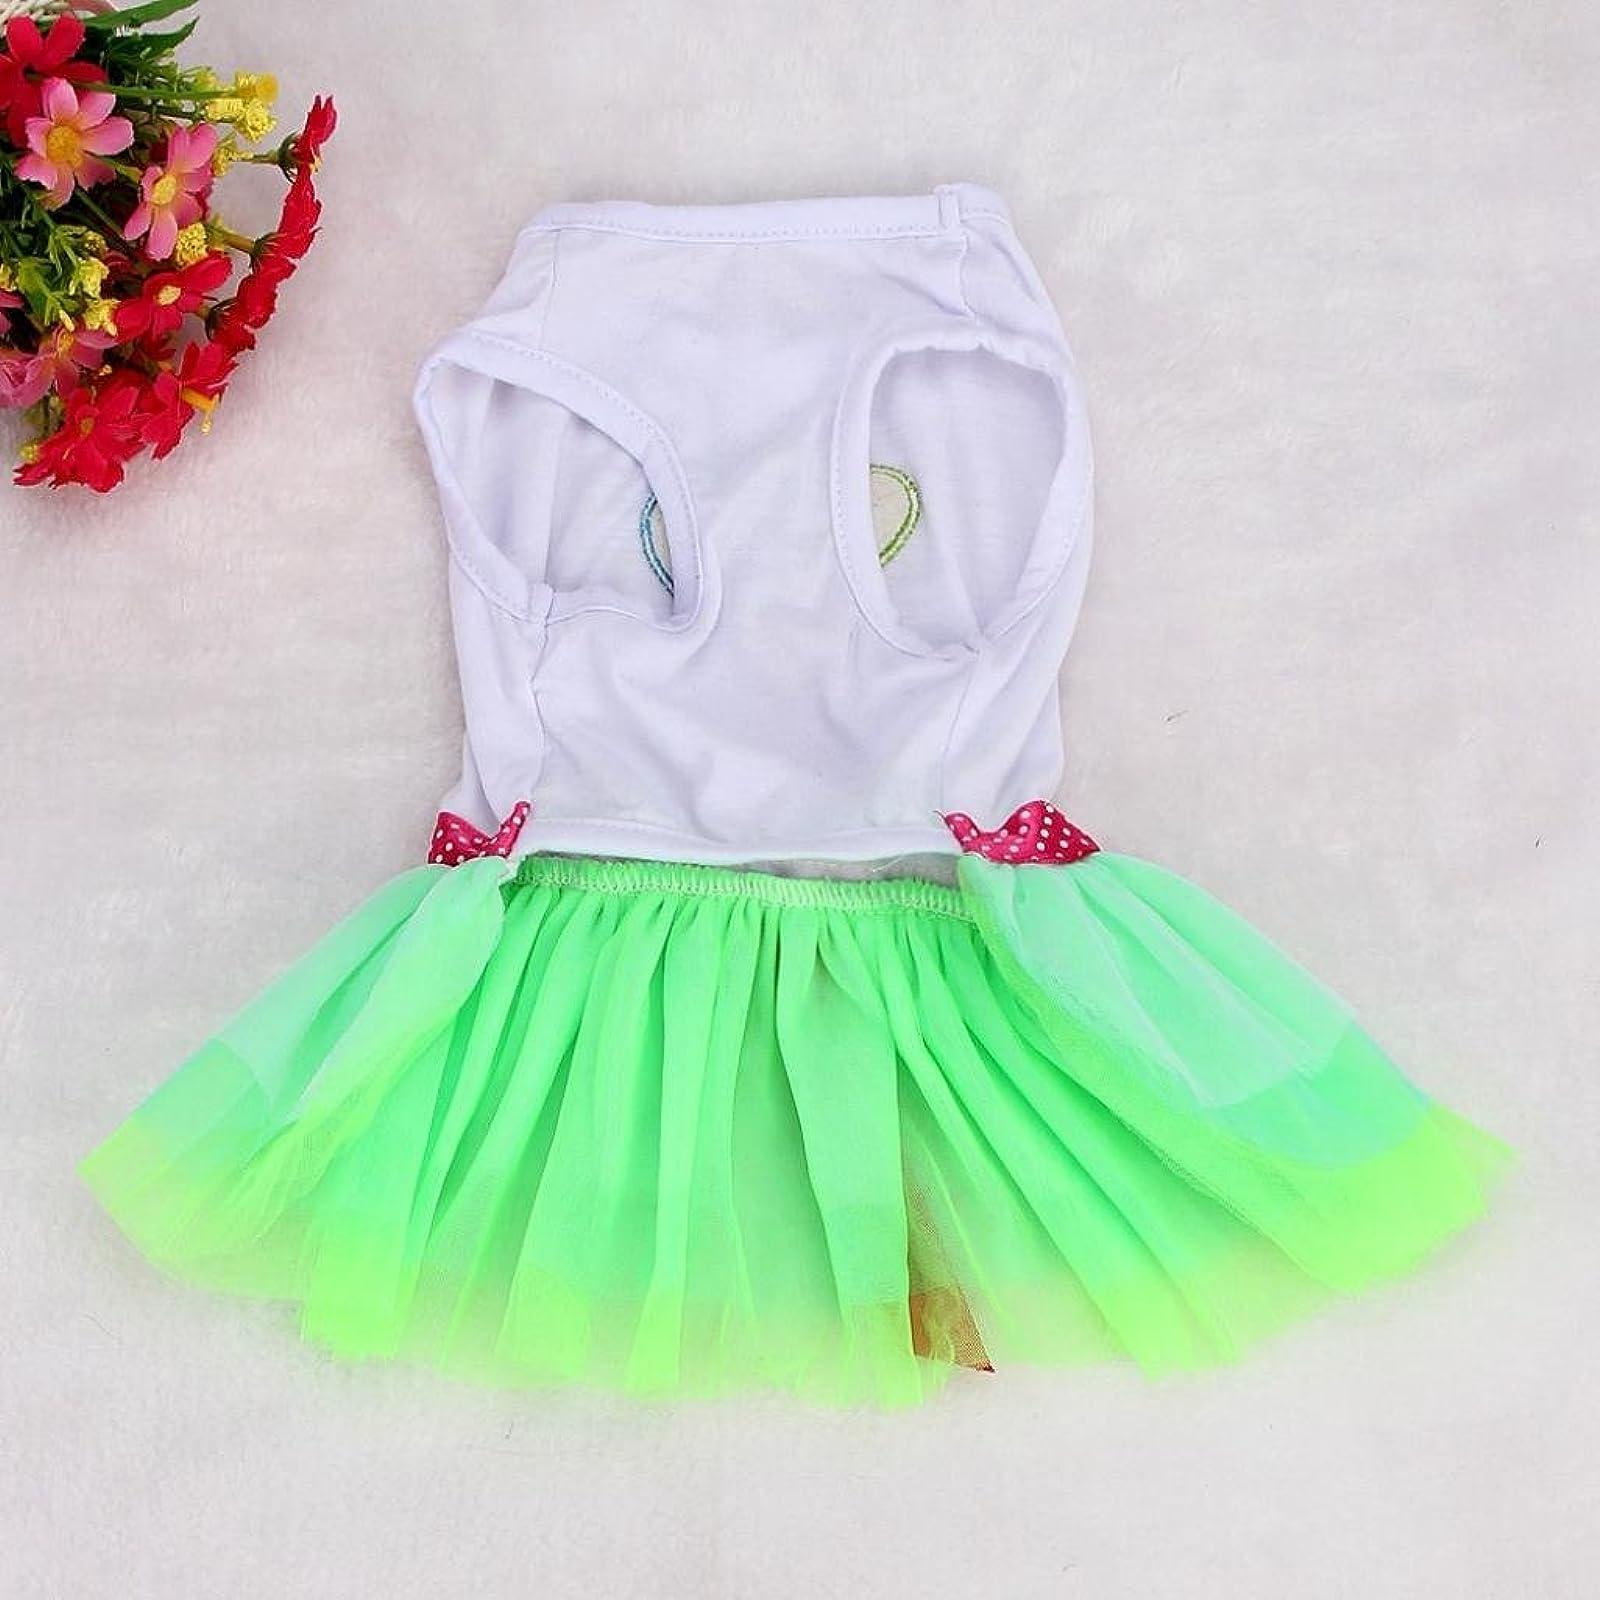 OutTop Girl Dog Dress Lace Princess Tutu WSM60224084S_YD - 2